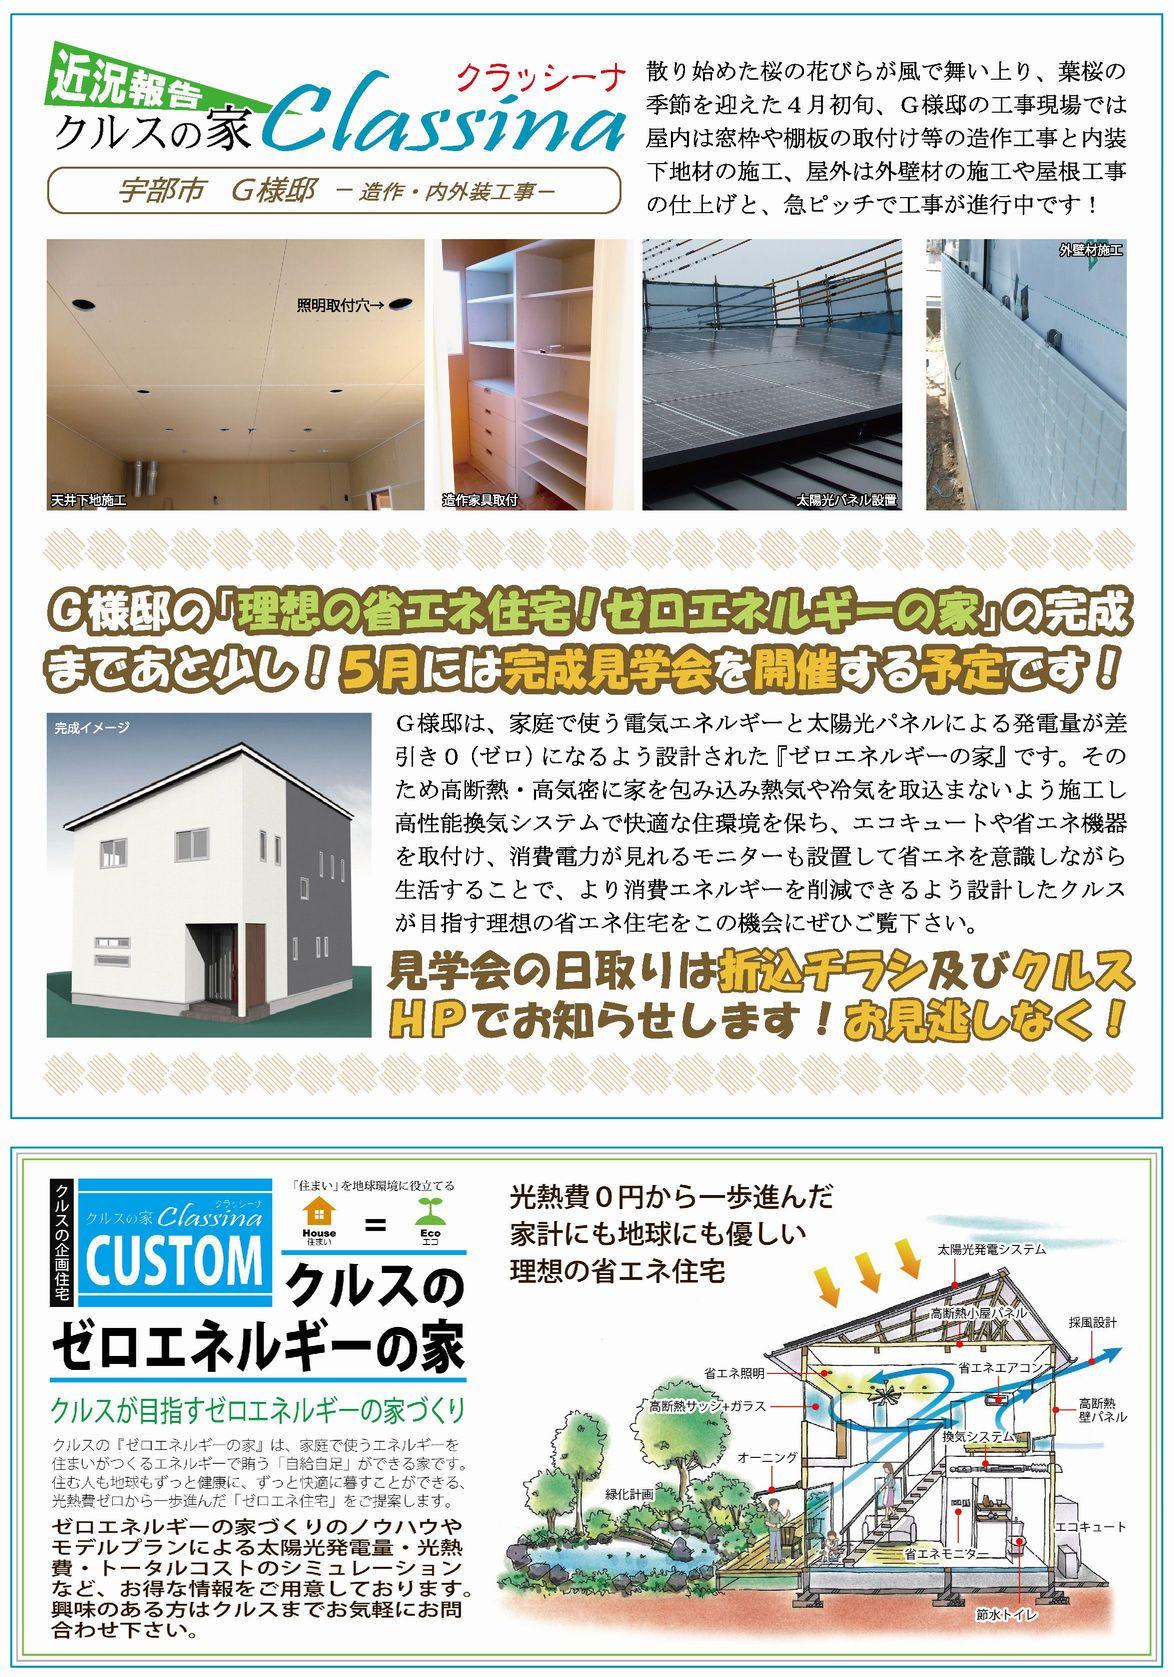 KuraSi-natu-sin95-04.jpg